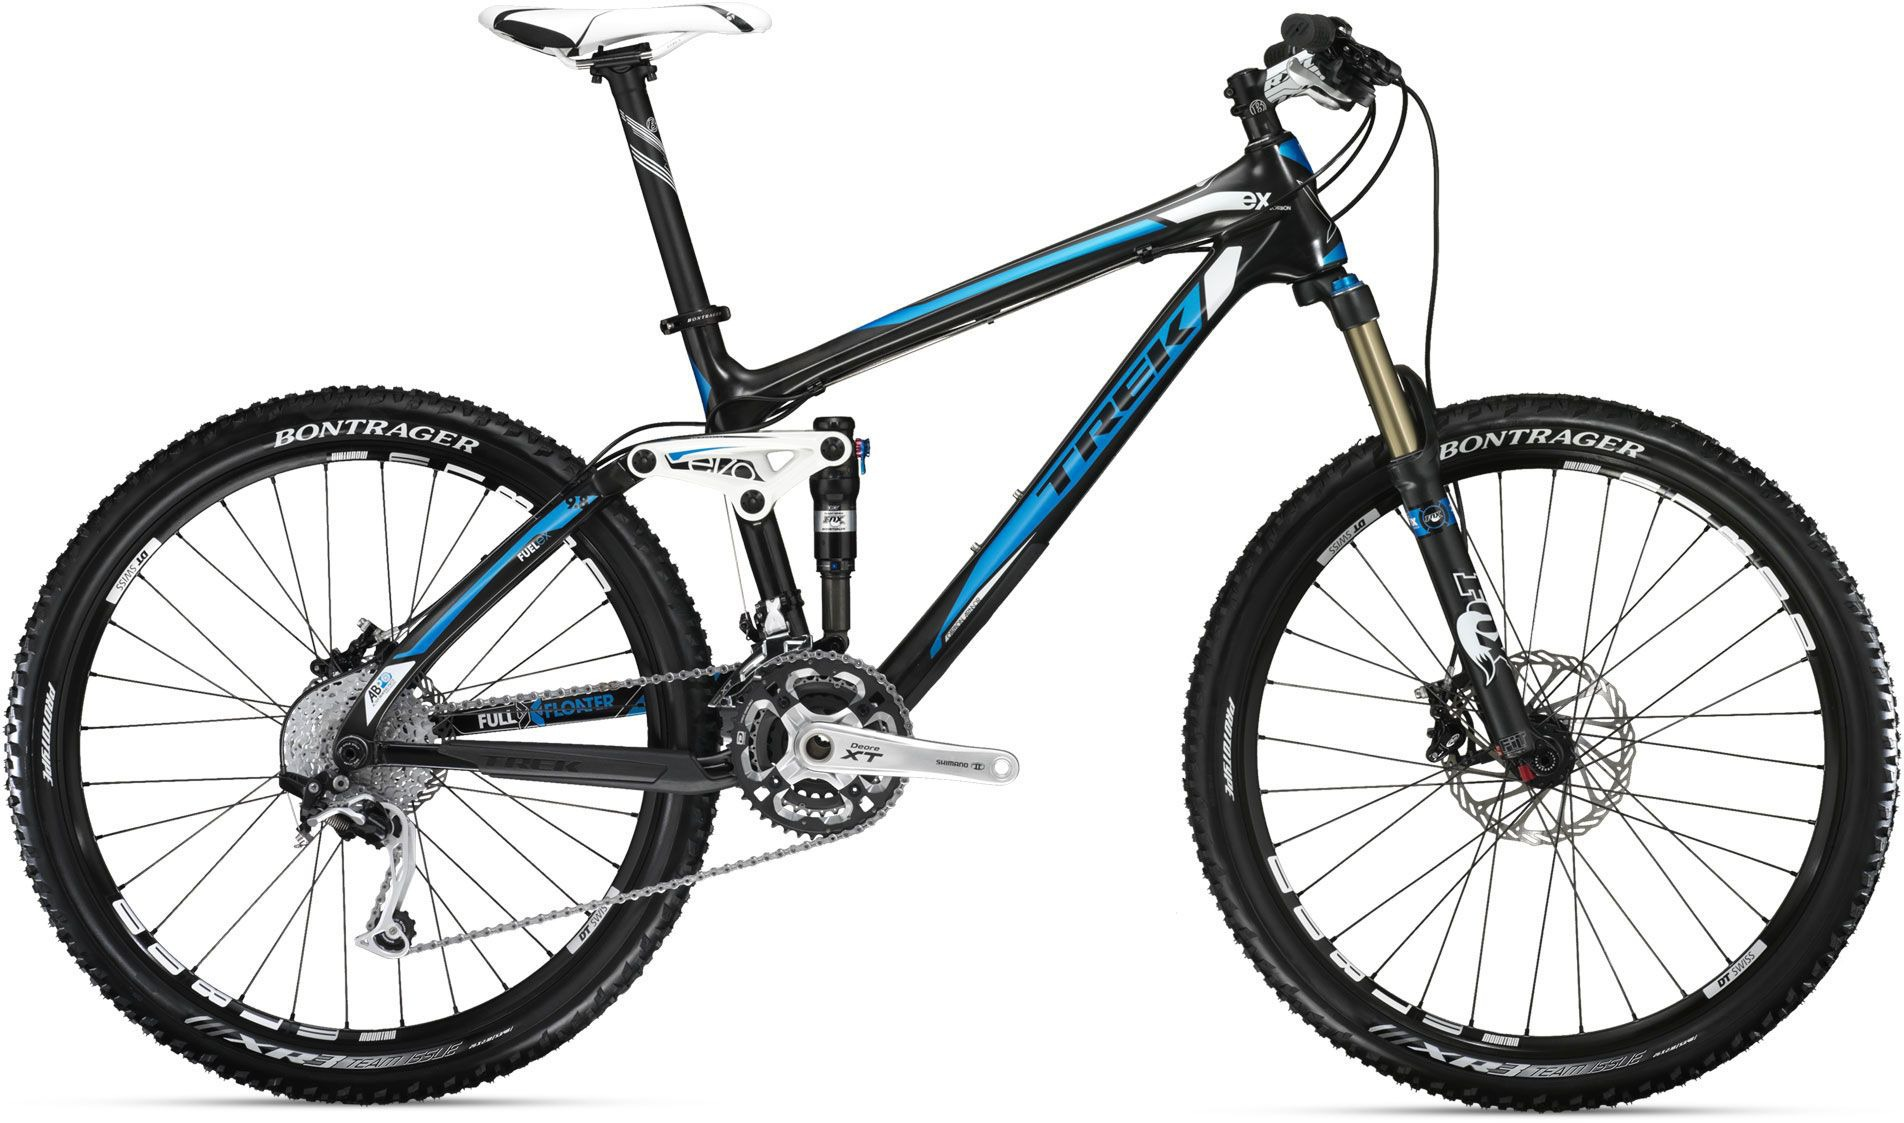 5e6f21aa124 Trek Fuel EX 9.8 - Ridgewood Cycle Shop 35 North Broad Street ...